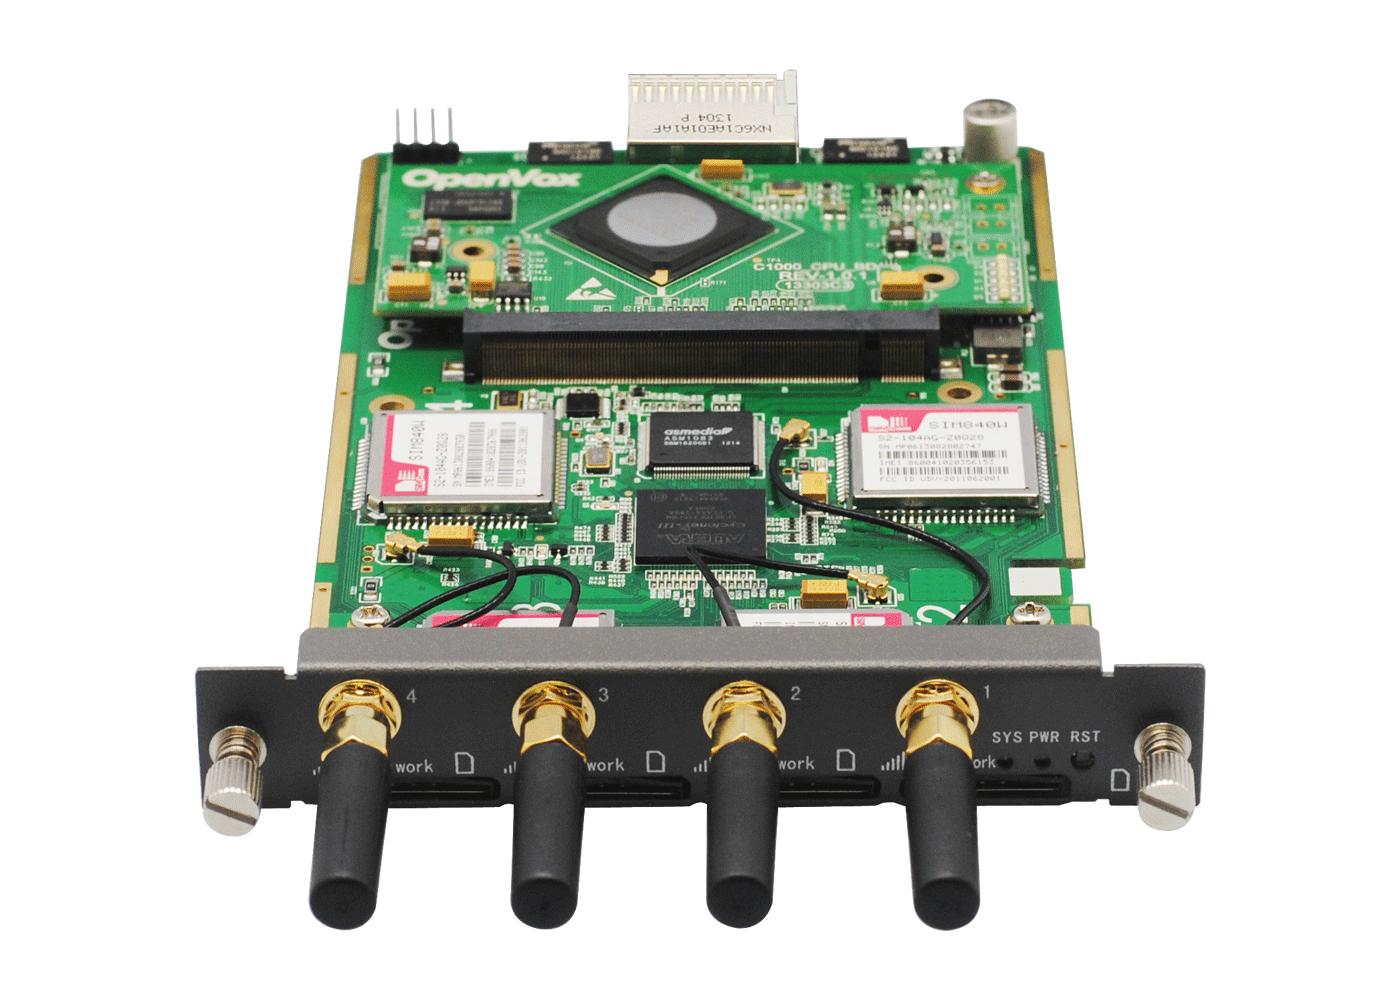 OpenVox VS-GGU-EIM401 (M35 module, Max power: 180W), VoxStack GGU-EIM401 4  GSM ports adapter module with Echo Cancellation, Multiple languages